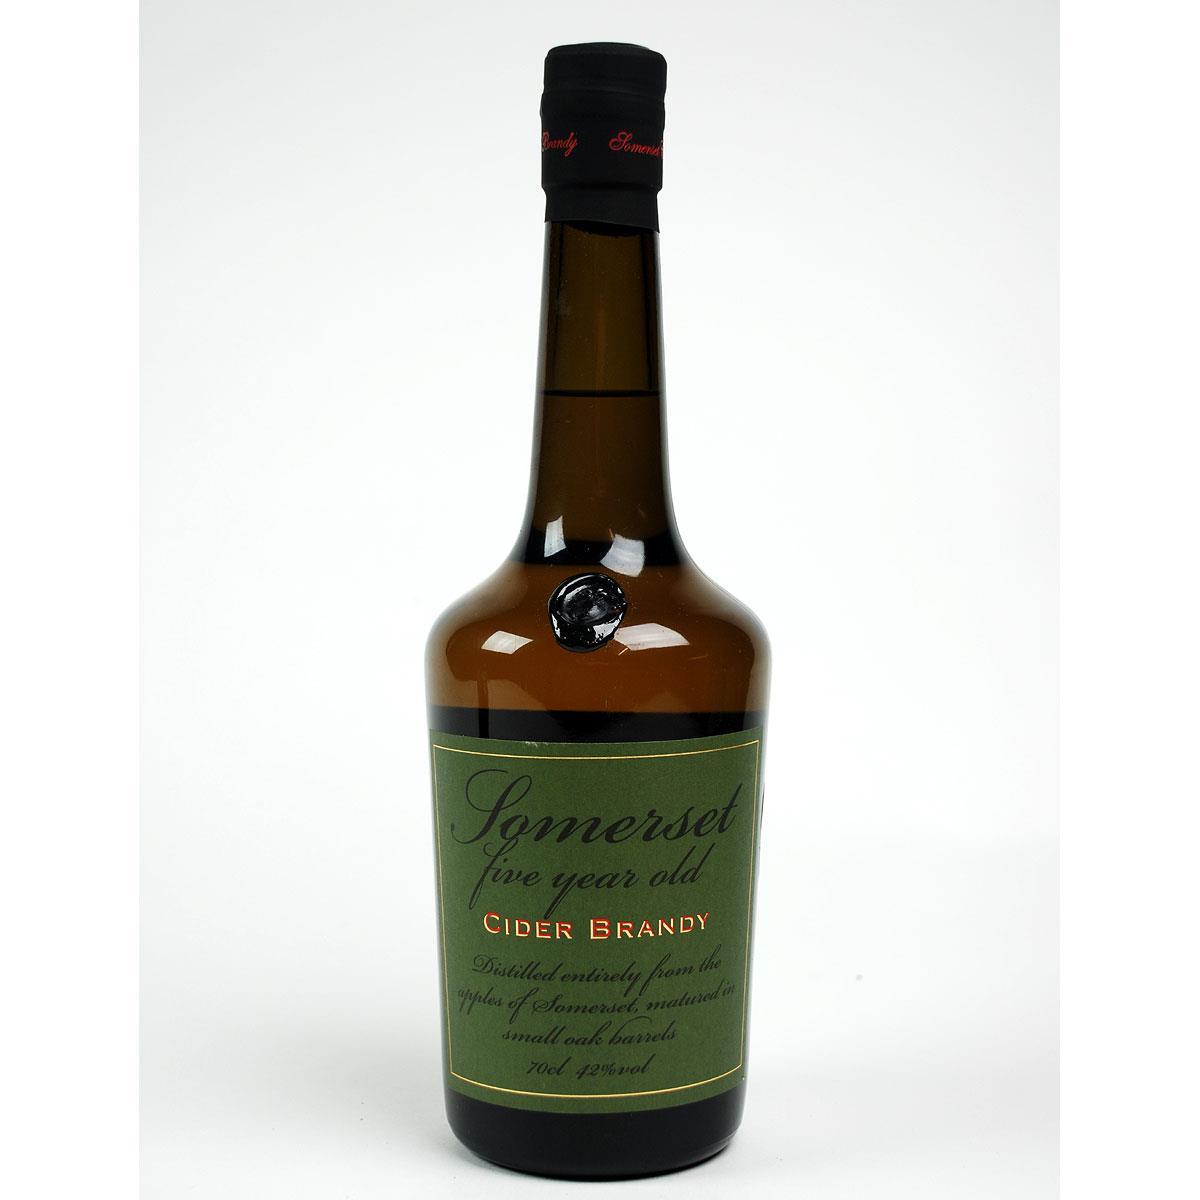 Somerset Cider Brandy: 5 year old - Bottle